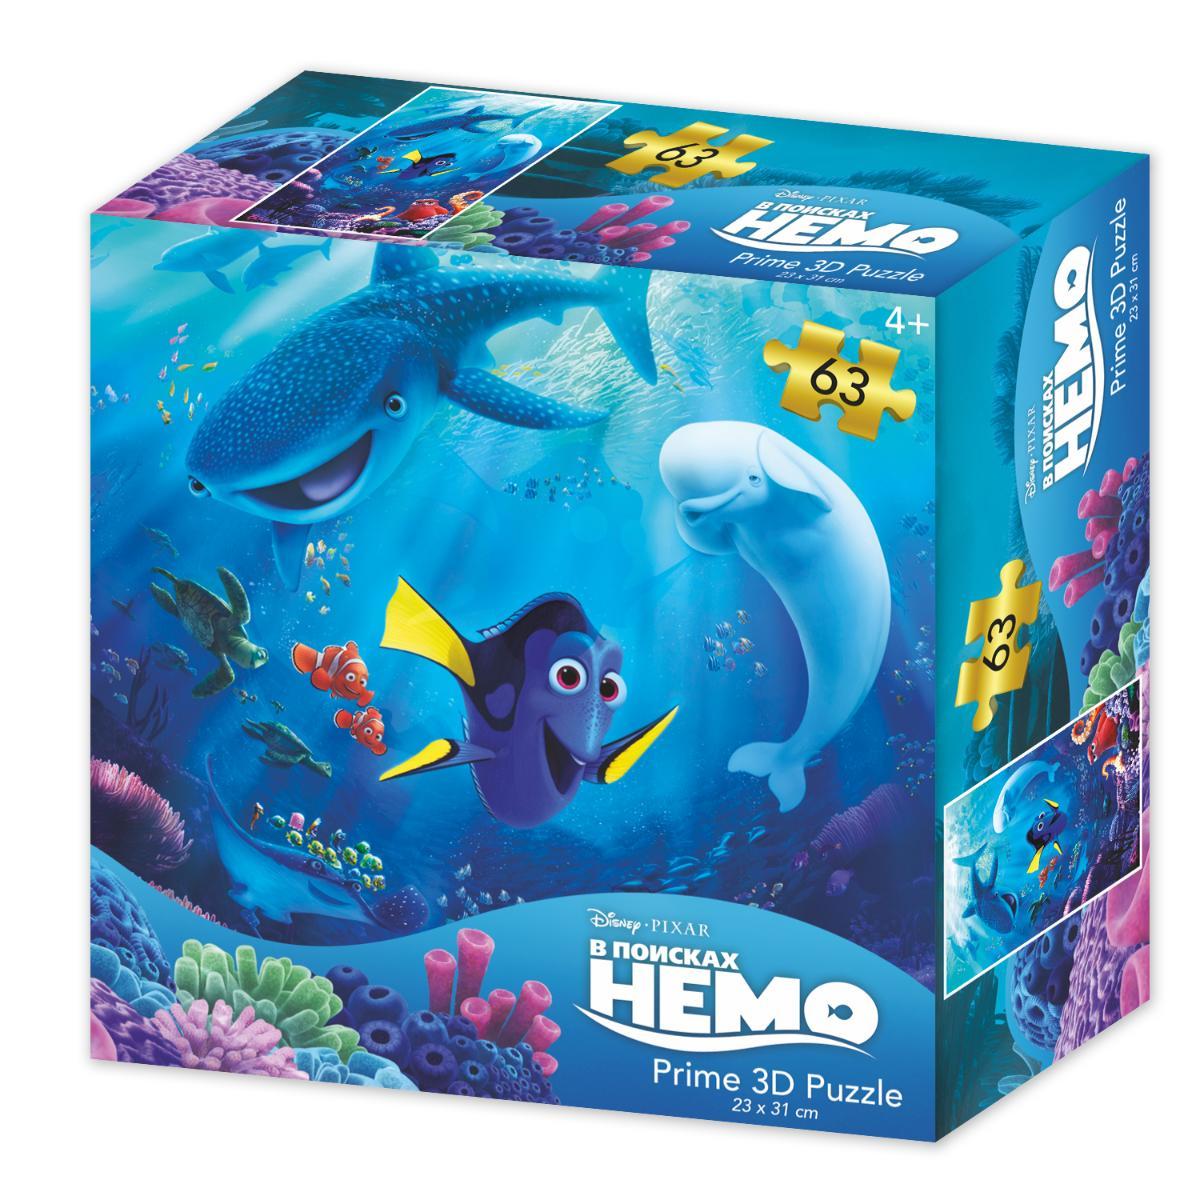 Super 3D Puzzle: Disney В поисках Немо (63 элемента)